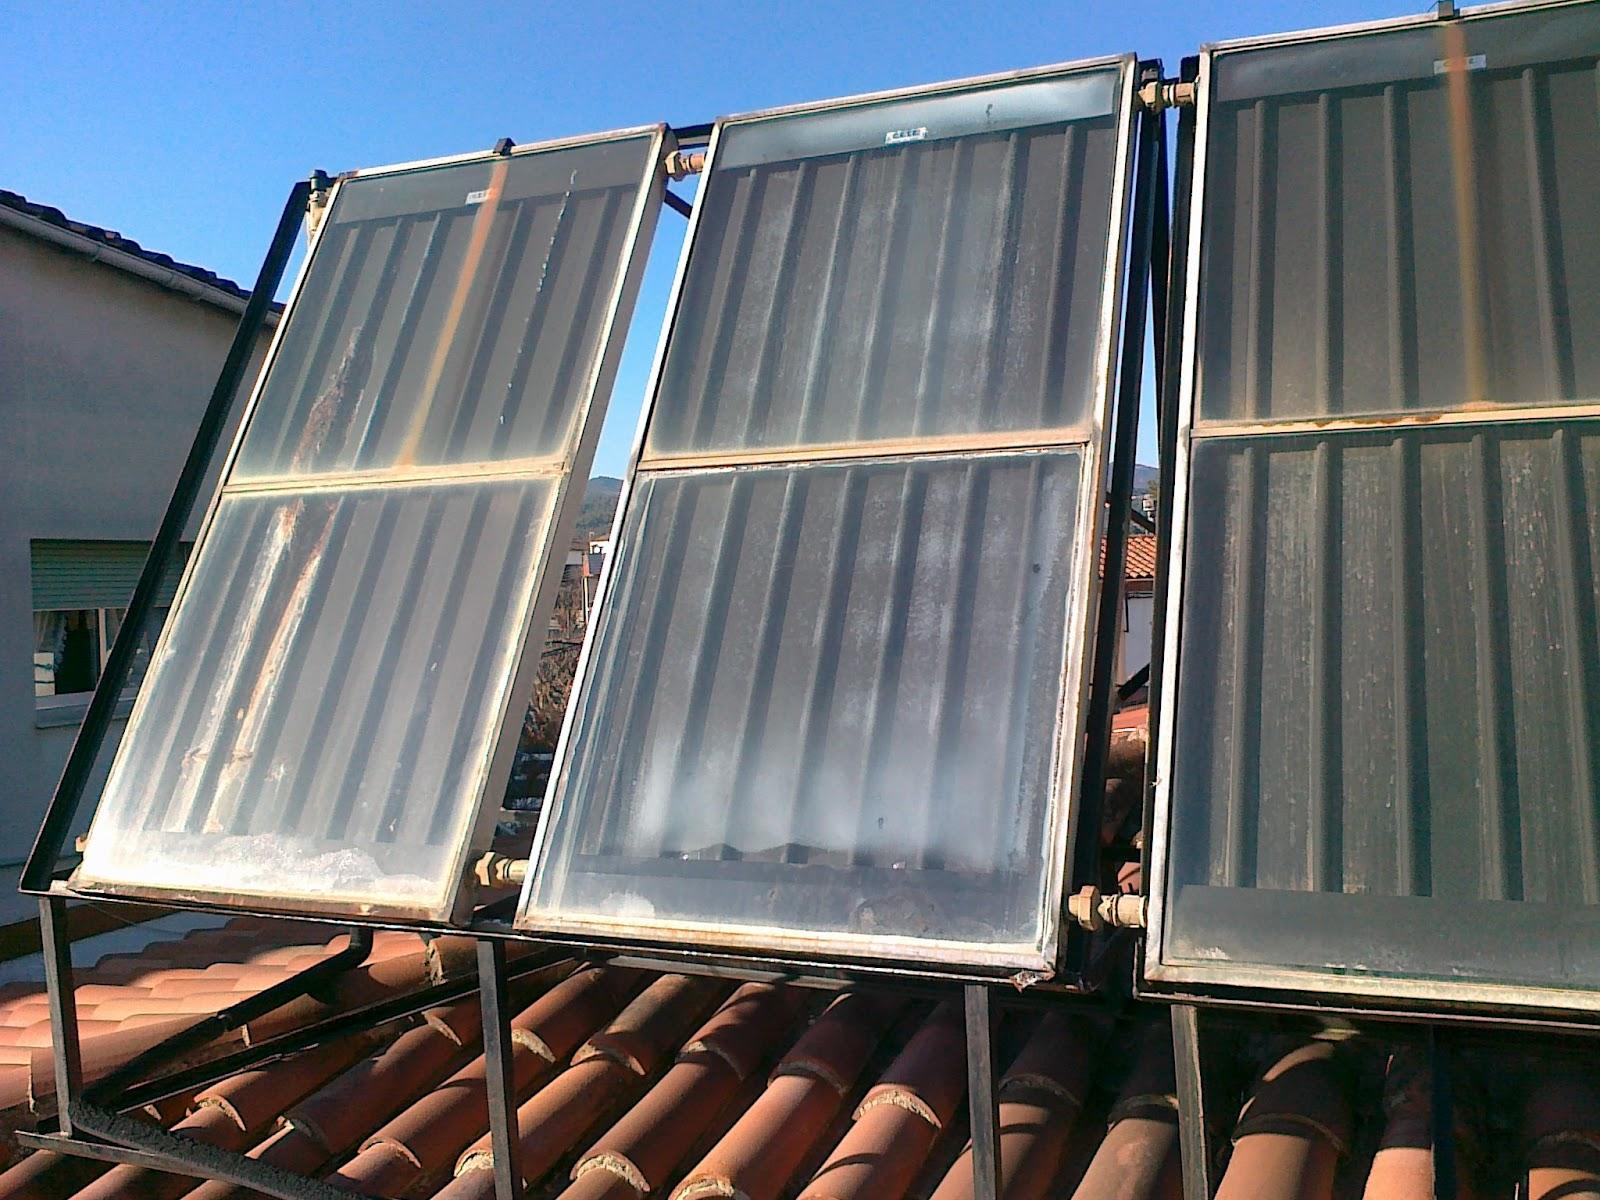 amortización de placas solares para calentar agua caliente